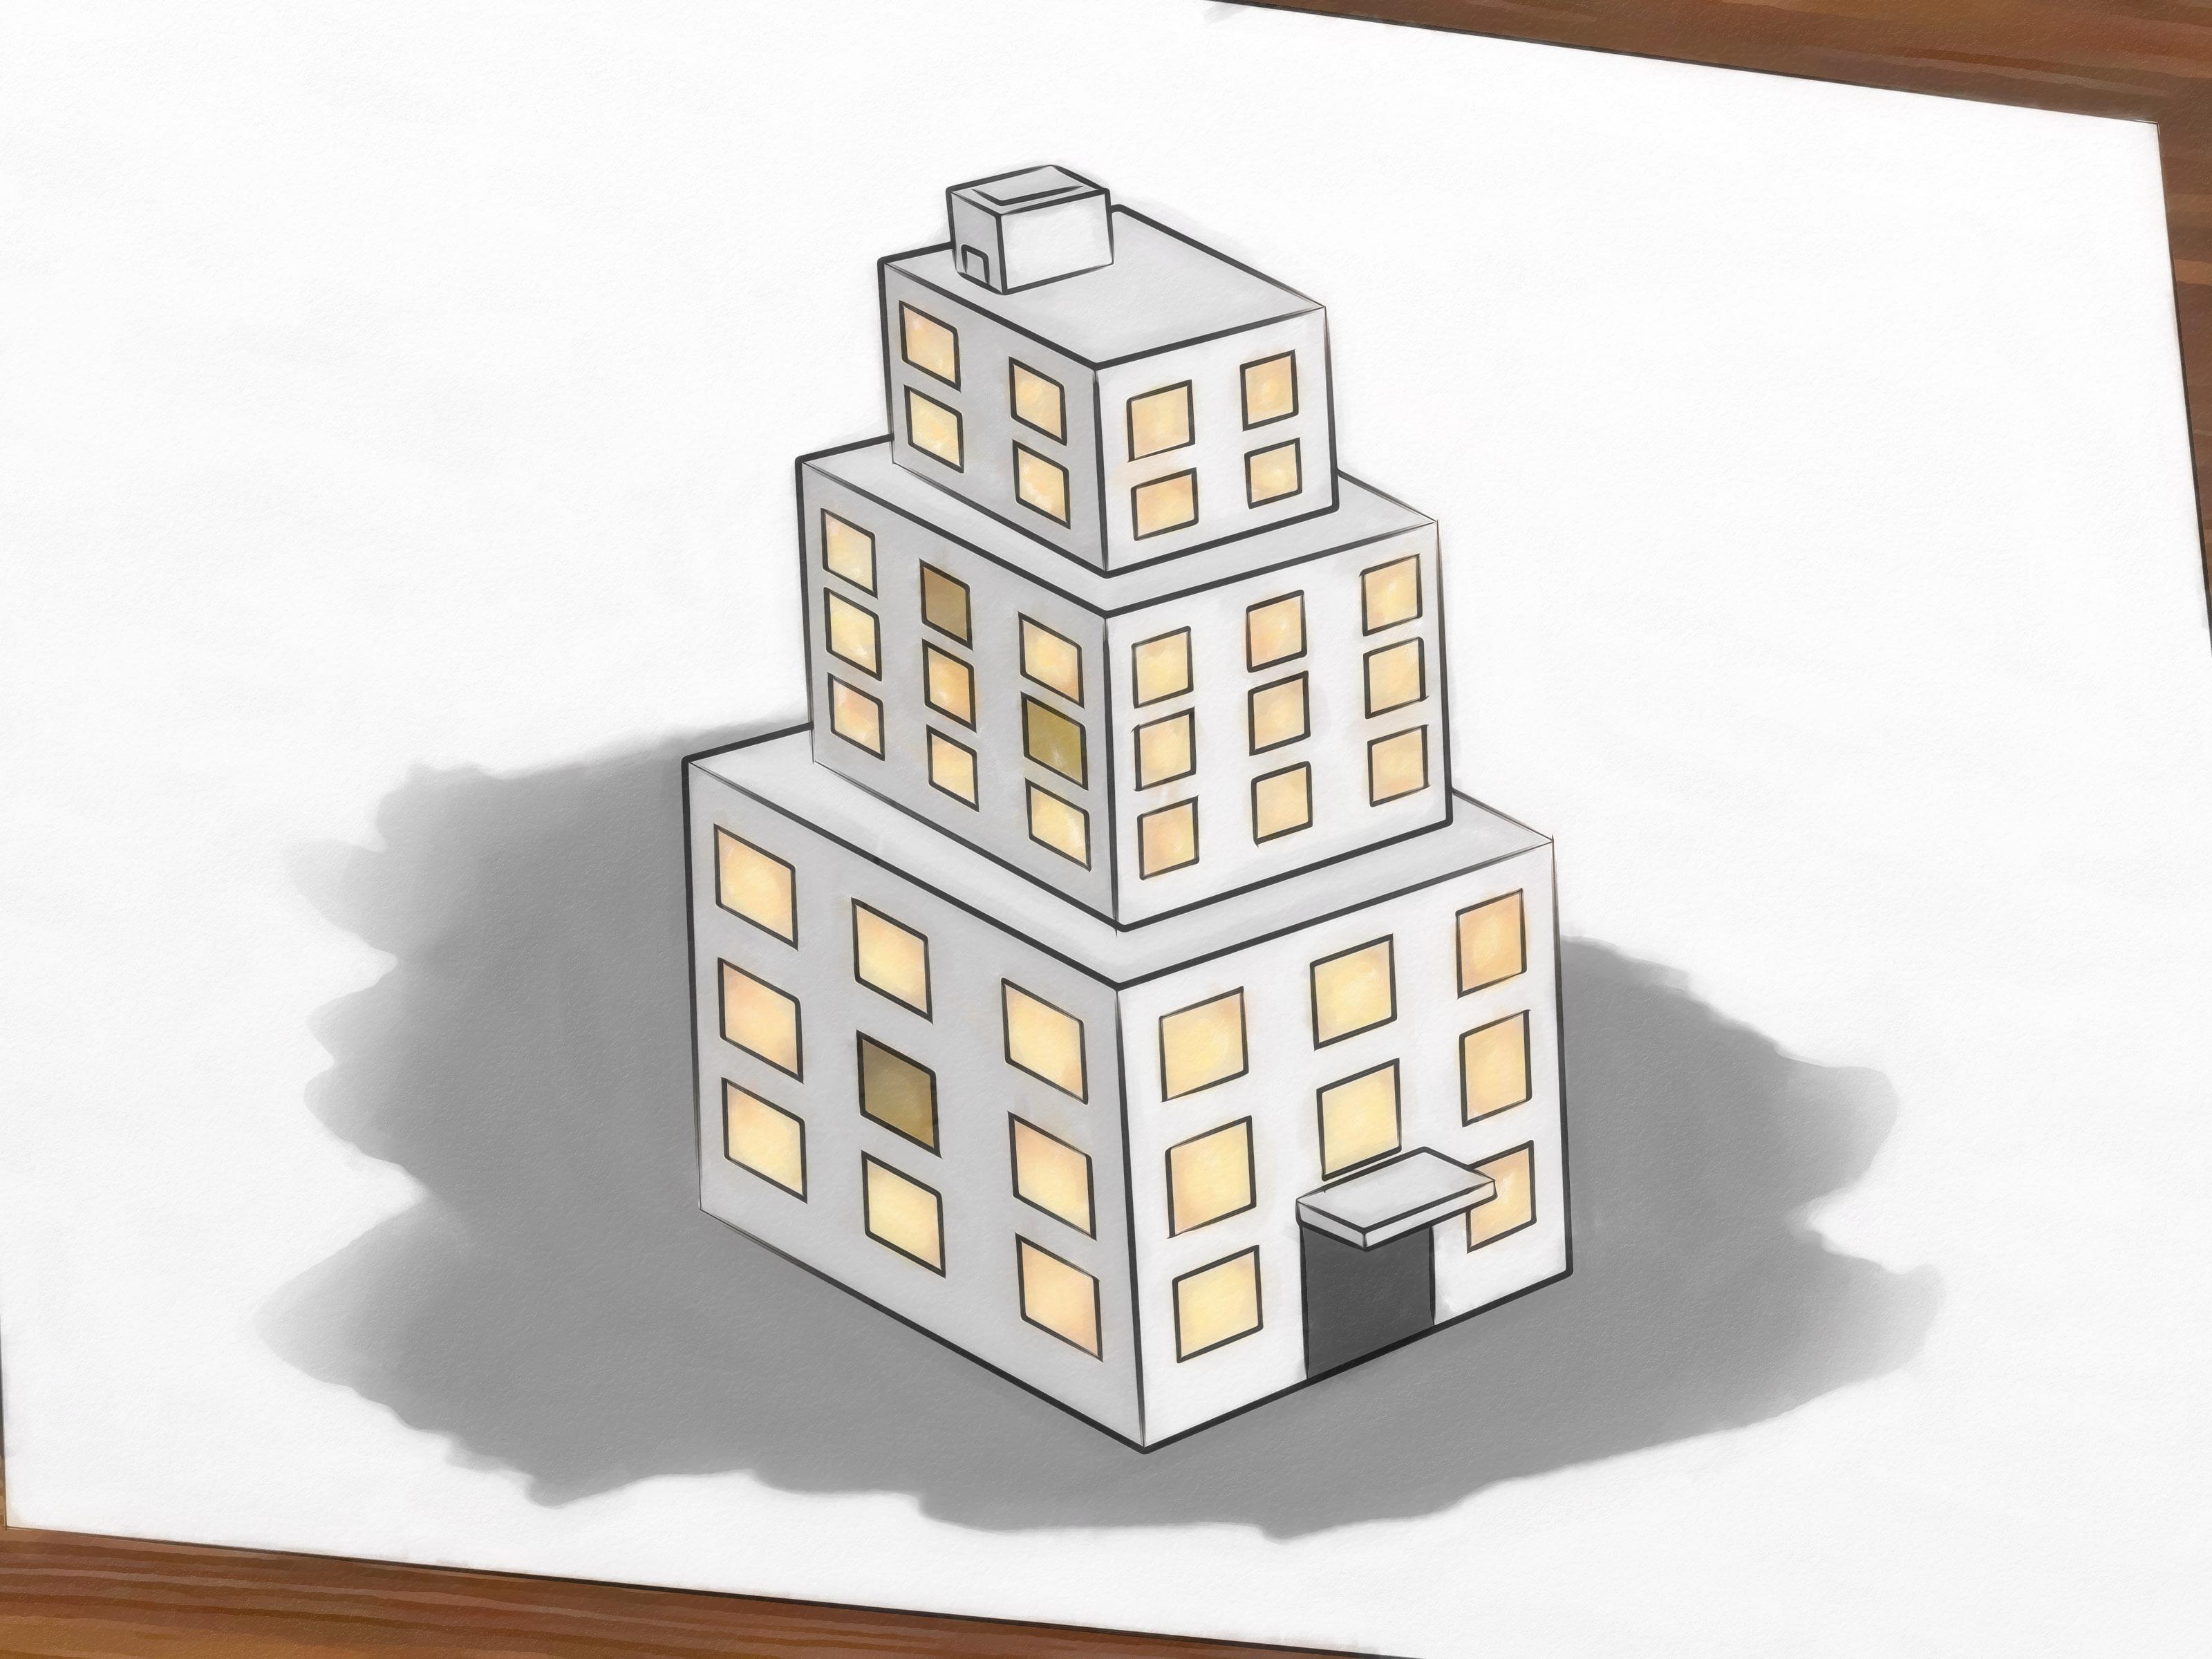 Building drawing at getdrawings. Buildings clipart simple